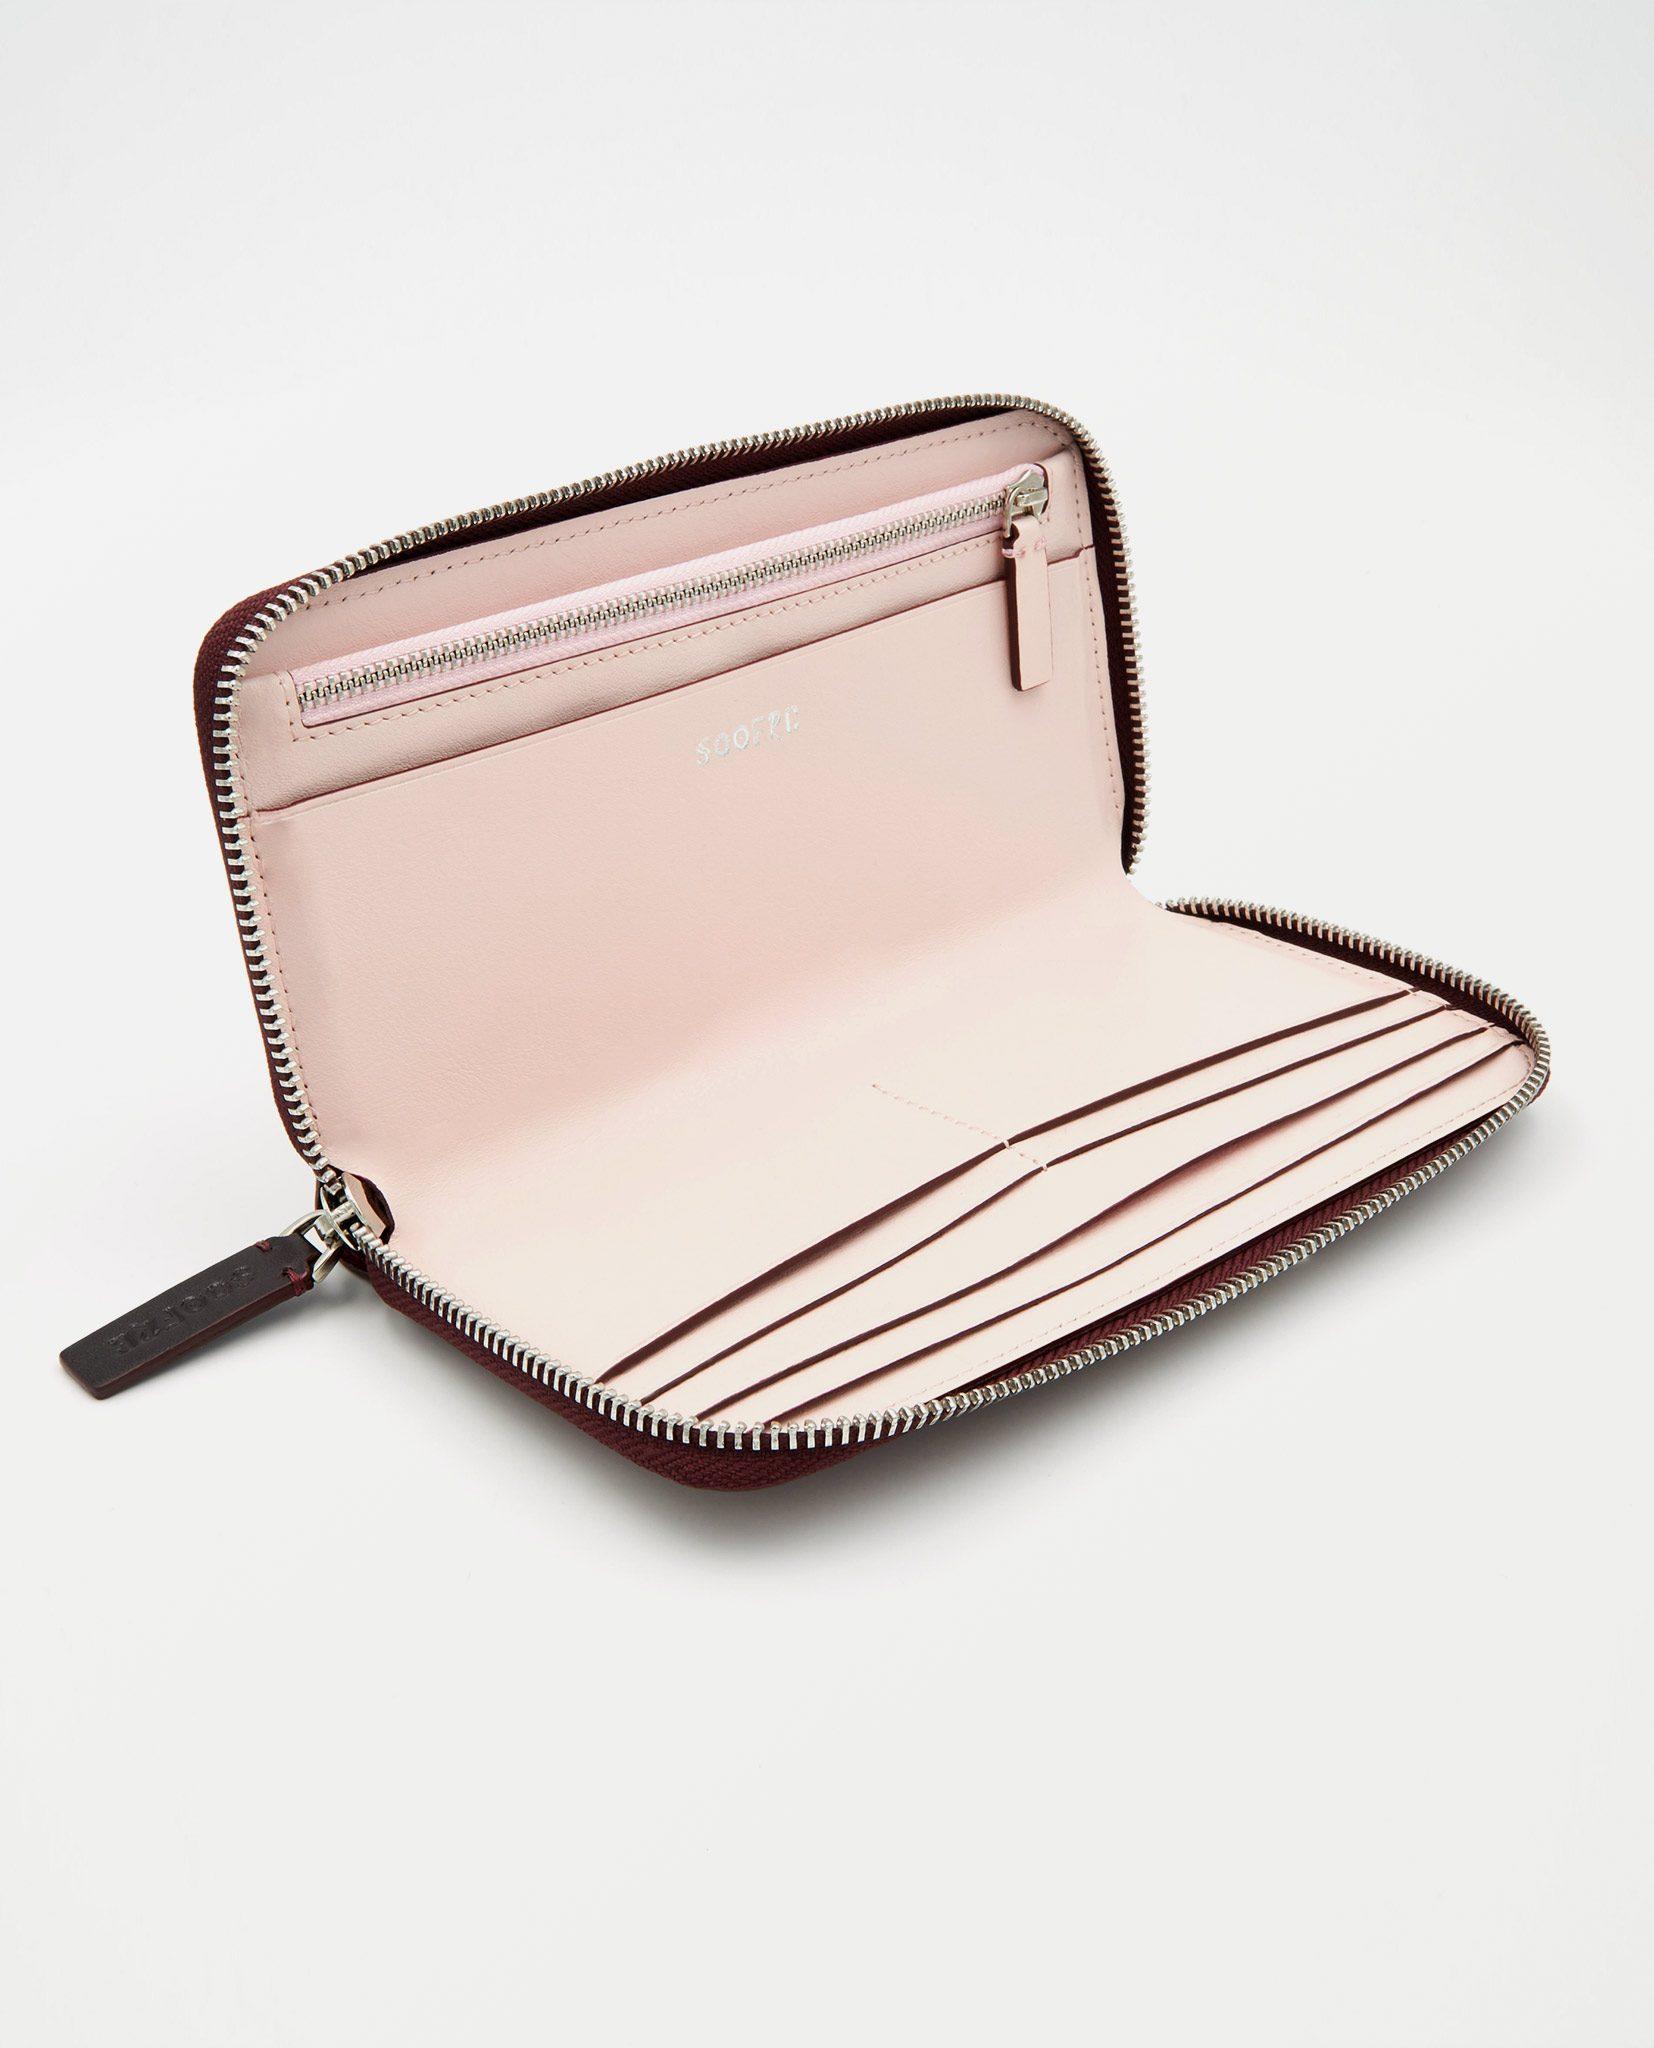 Soofre_Womens-Zip-Wallet-Croco-Burgundy-Blush_2